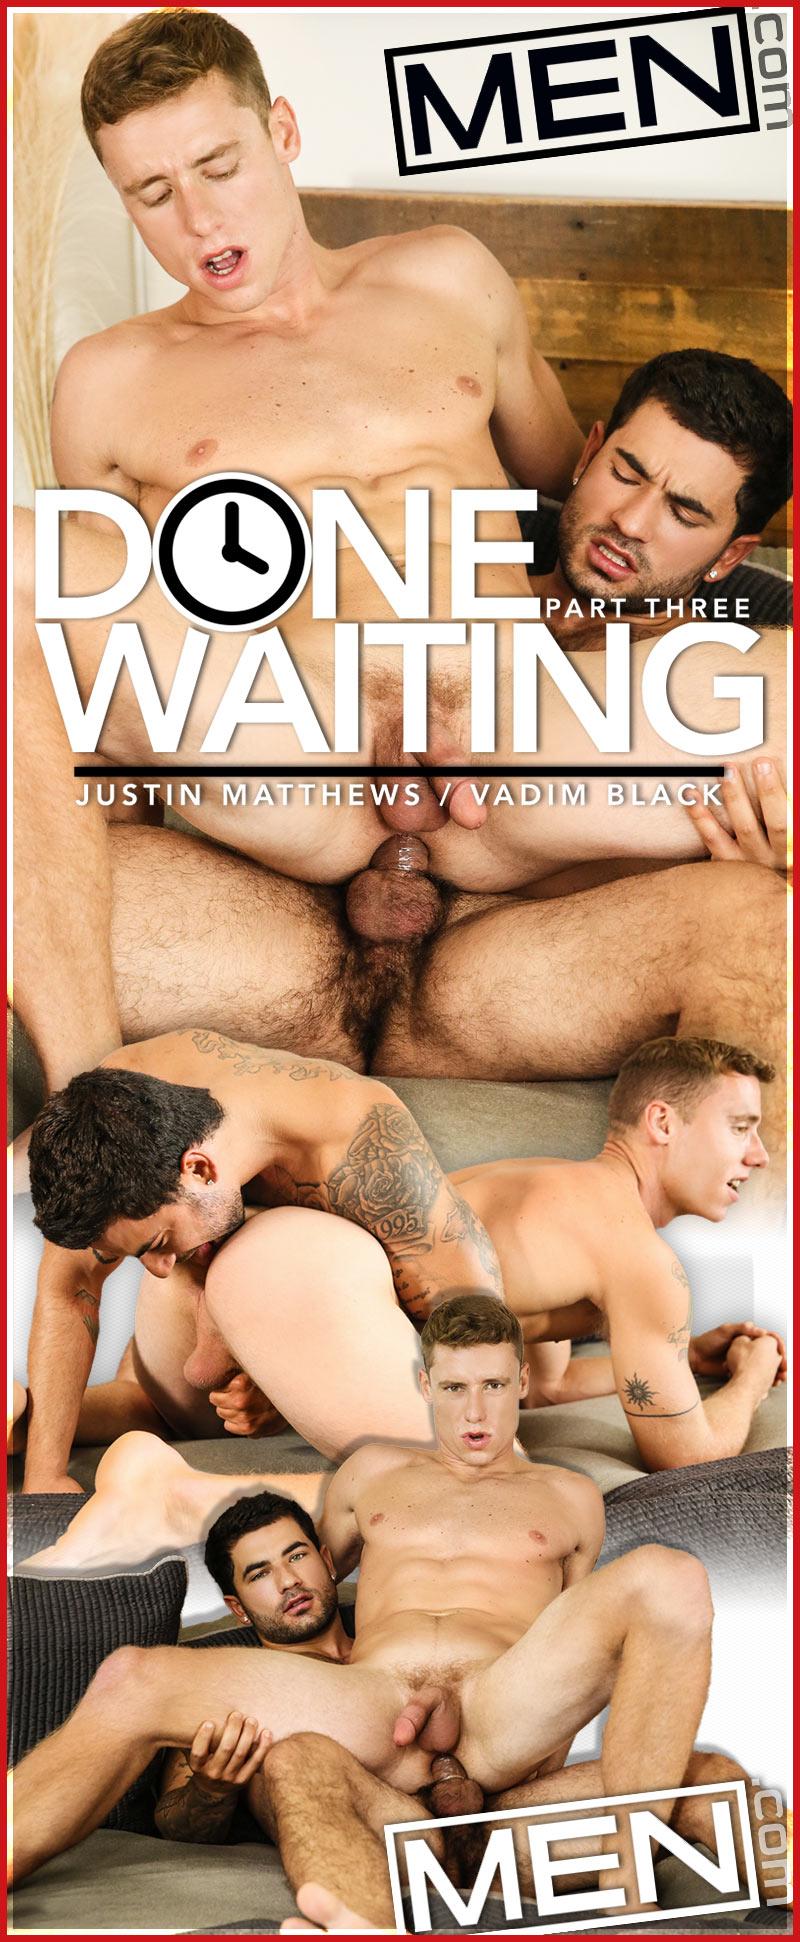 Done Waiting, Part Three (Vadim Black Fucks Justin Matthews) at MEN.com